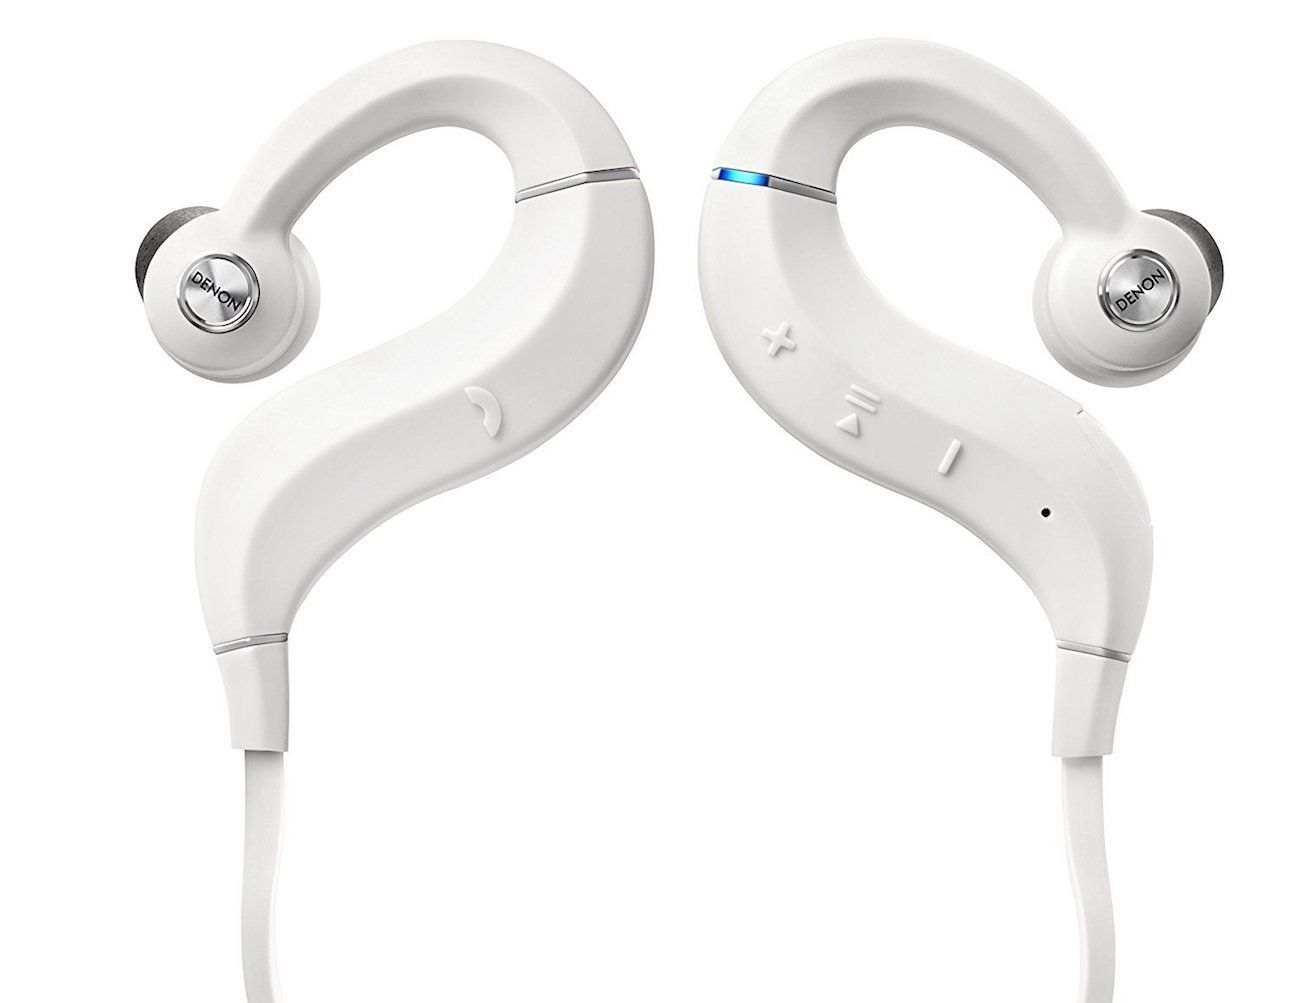 Denon AH-C160 Wireless Sport Headphones